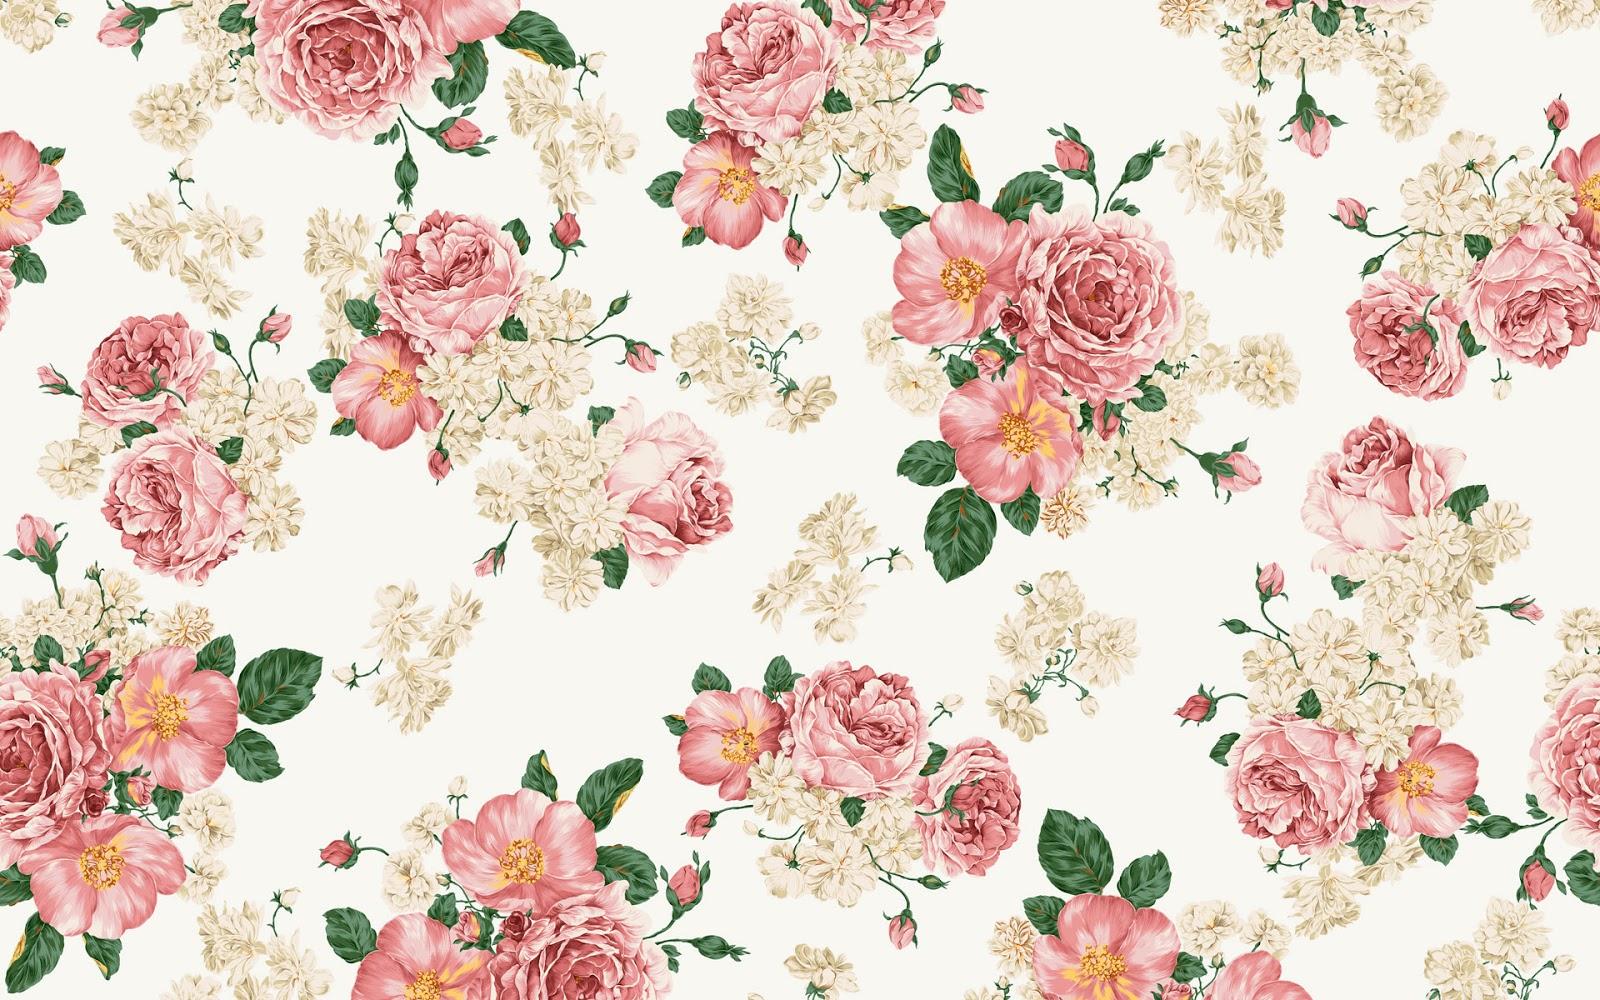 vintage floral wallpaper pattern 1600x1000